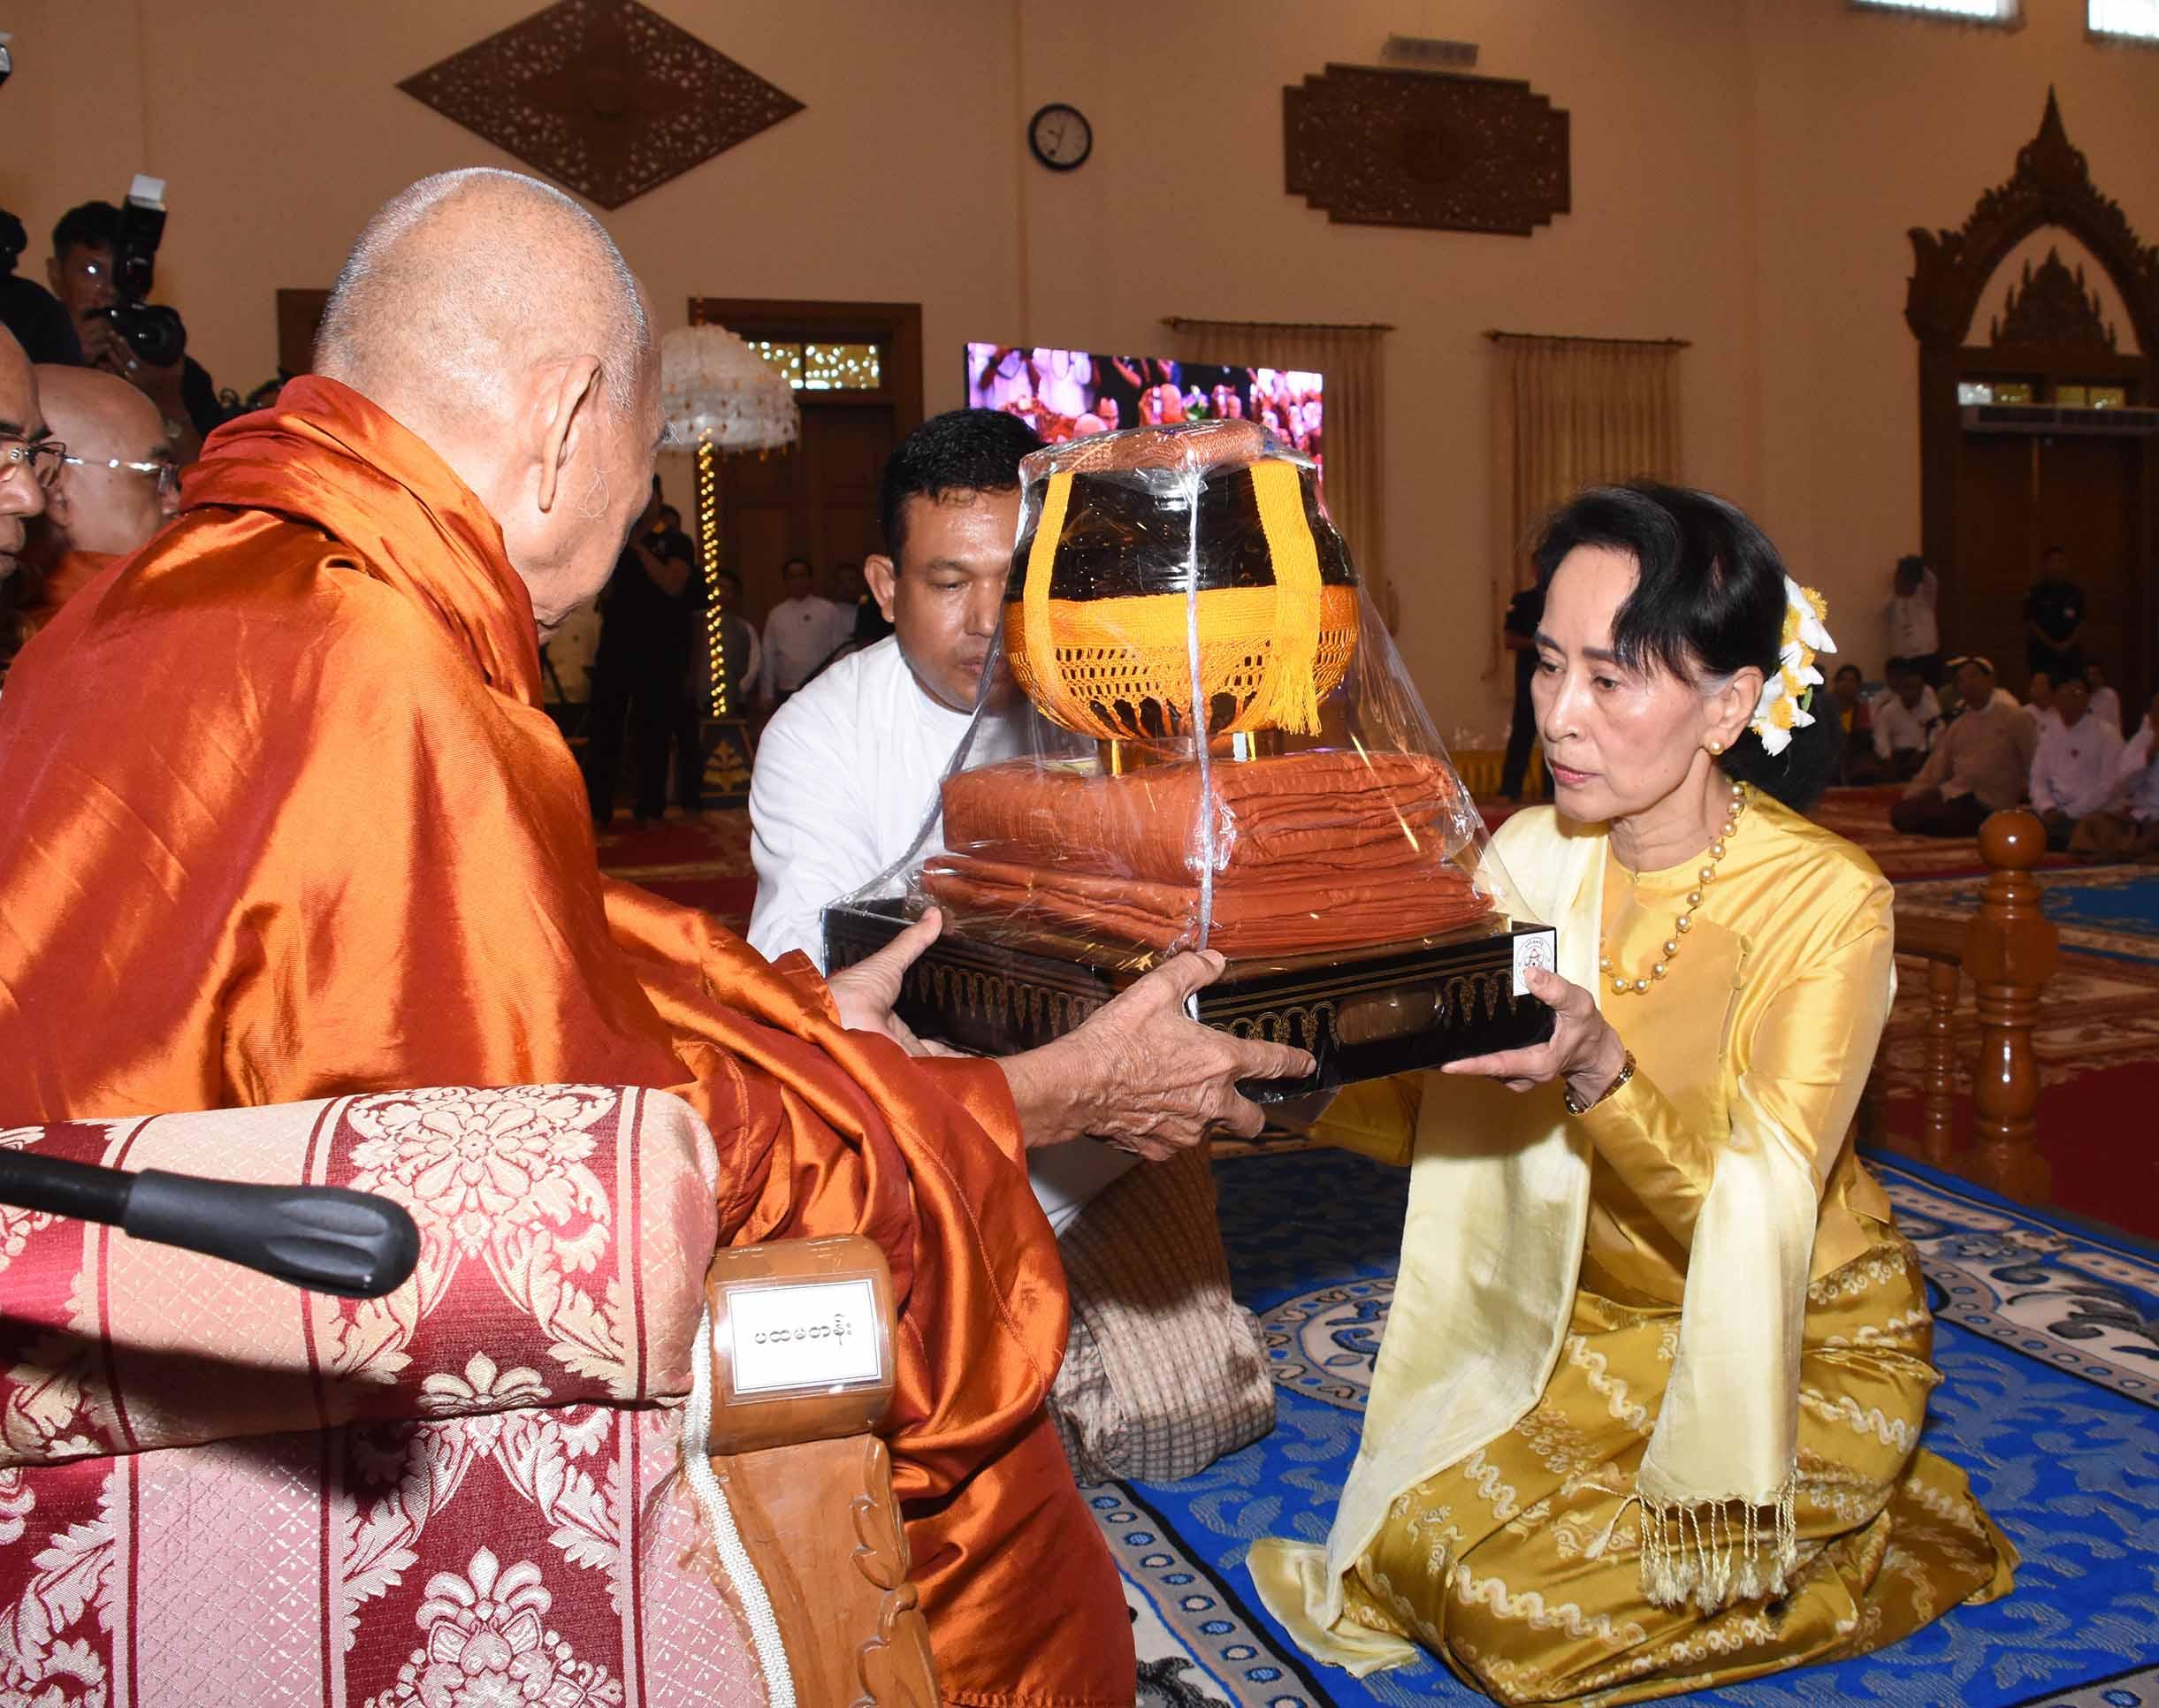 State Counsellor Daw Aung San Suu Kyi offers Kathina robes to a senior monk at Sasana Beikman in Nay Pyi Taw on 12 October 2017. Photo: MNA